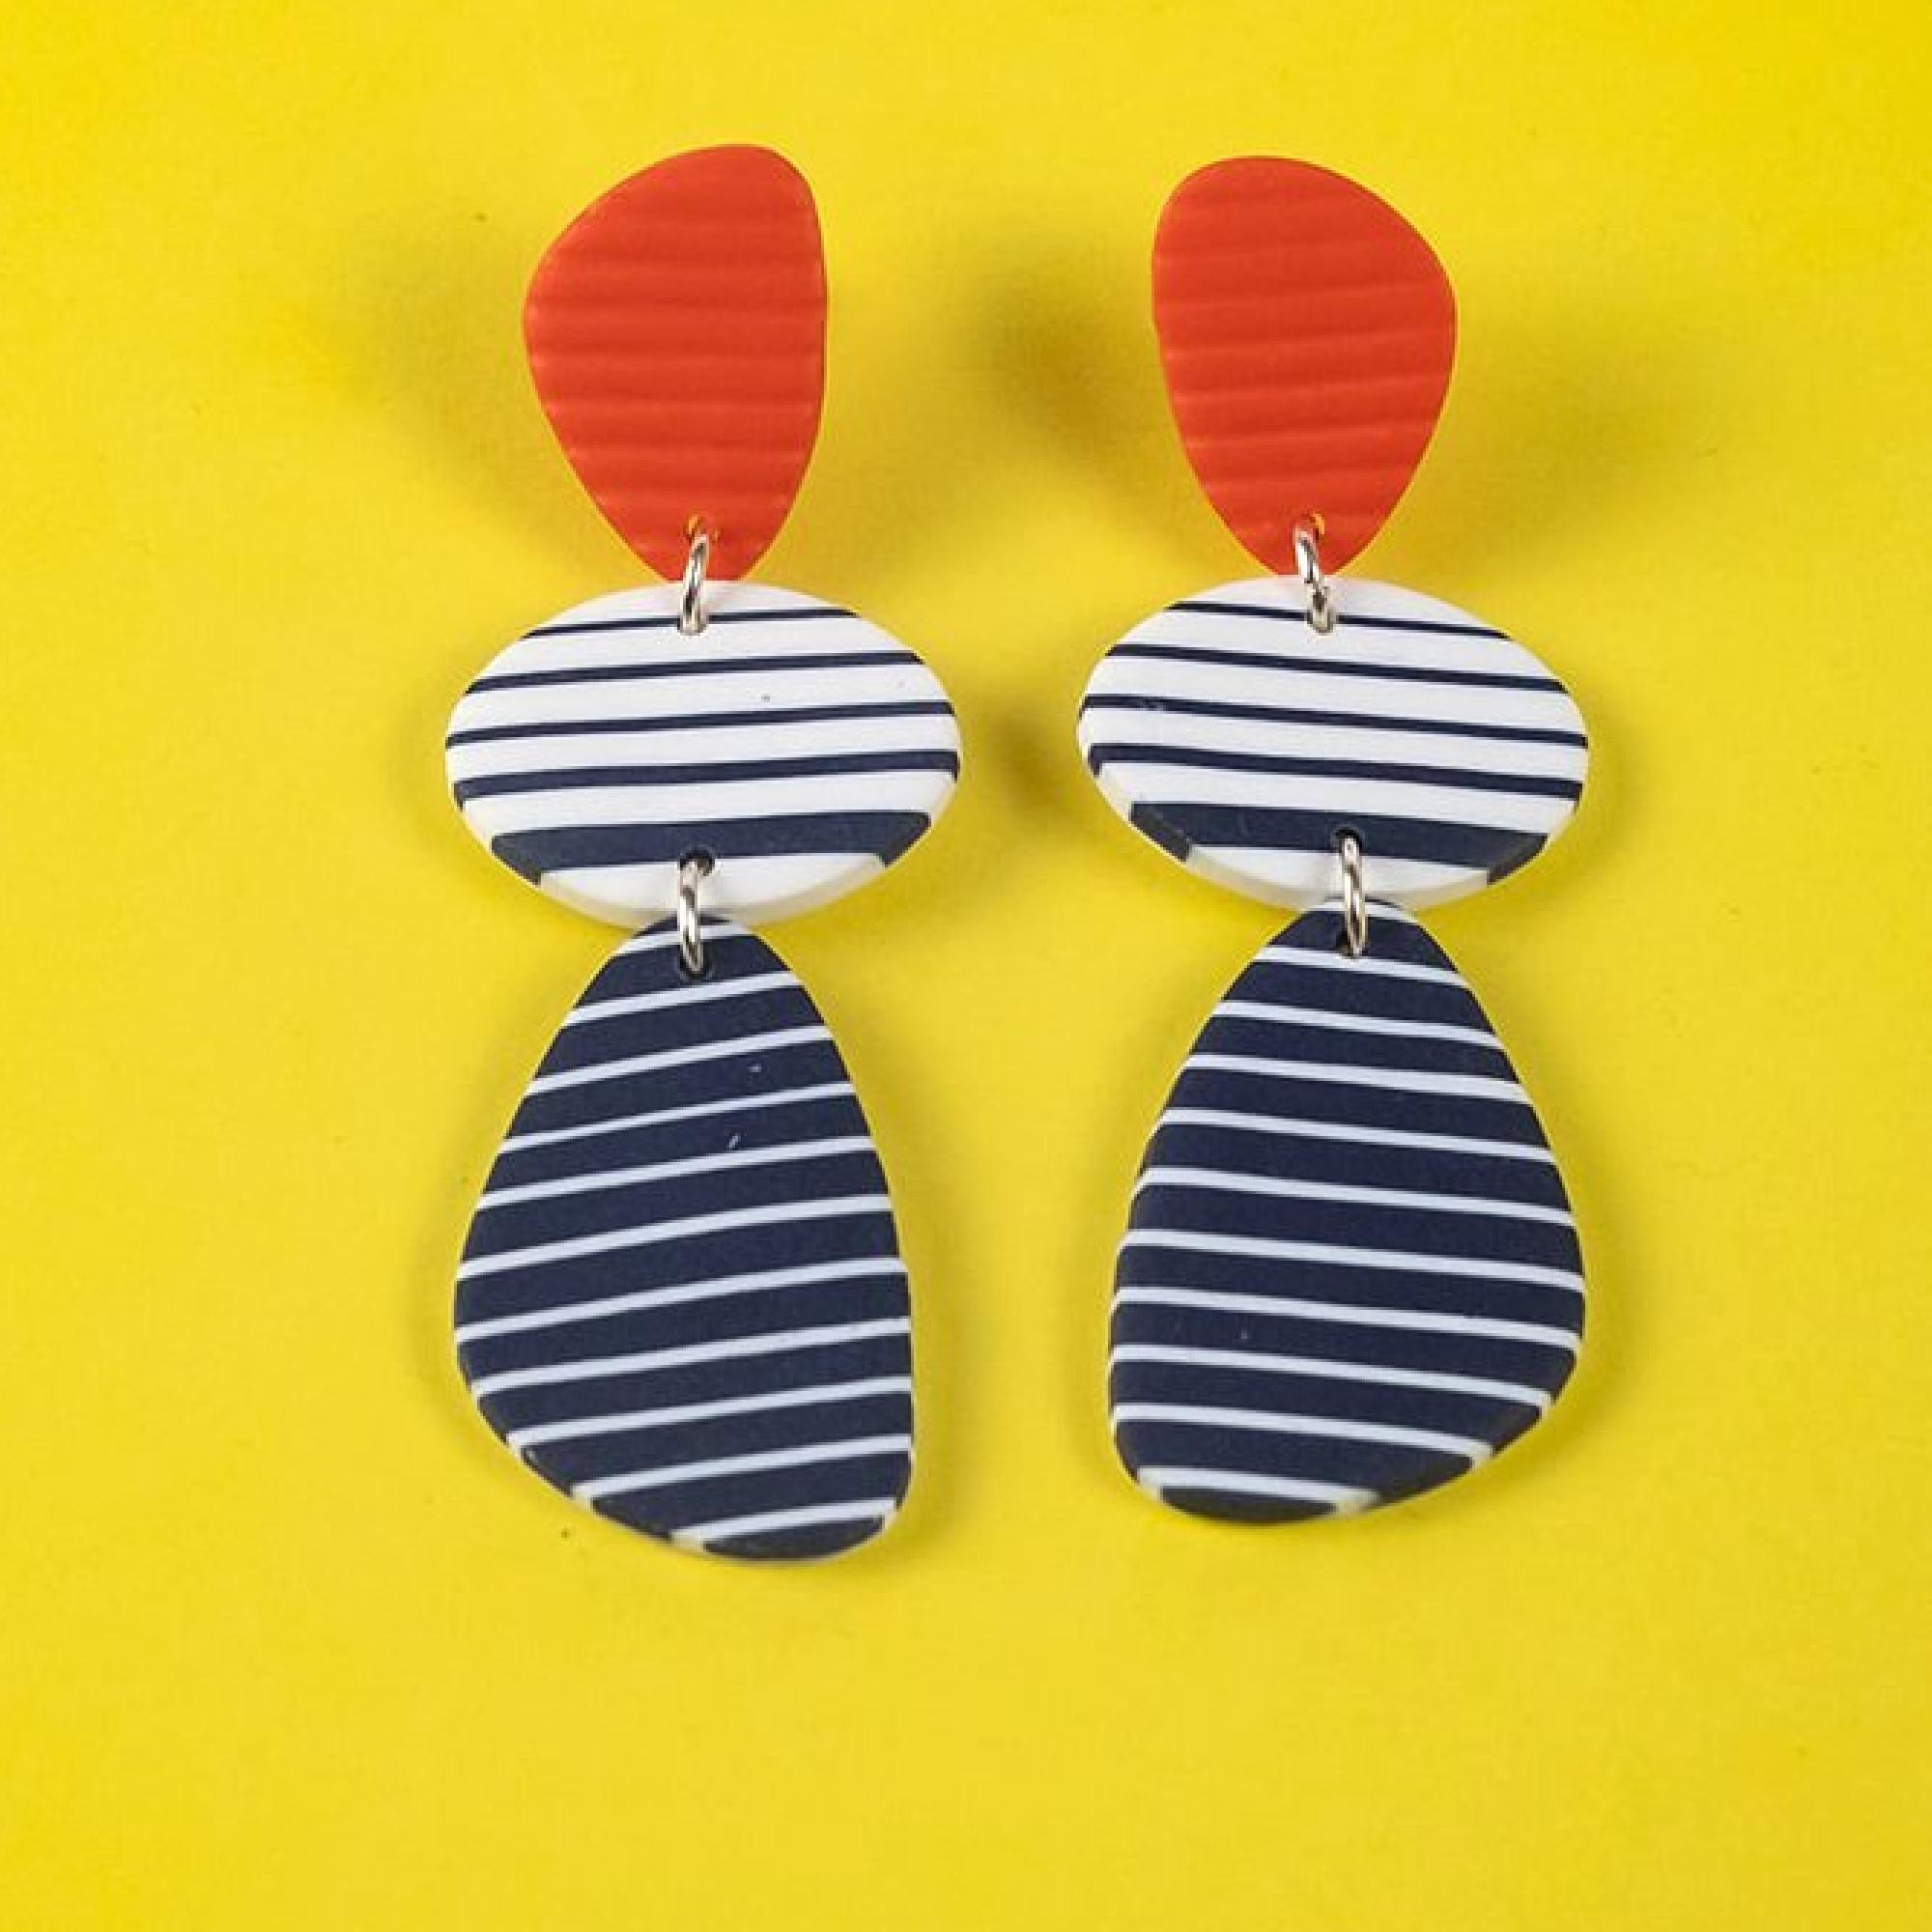 Le Croisic Breton Earrings by Nadege Honey